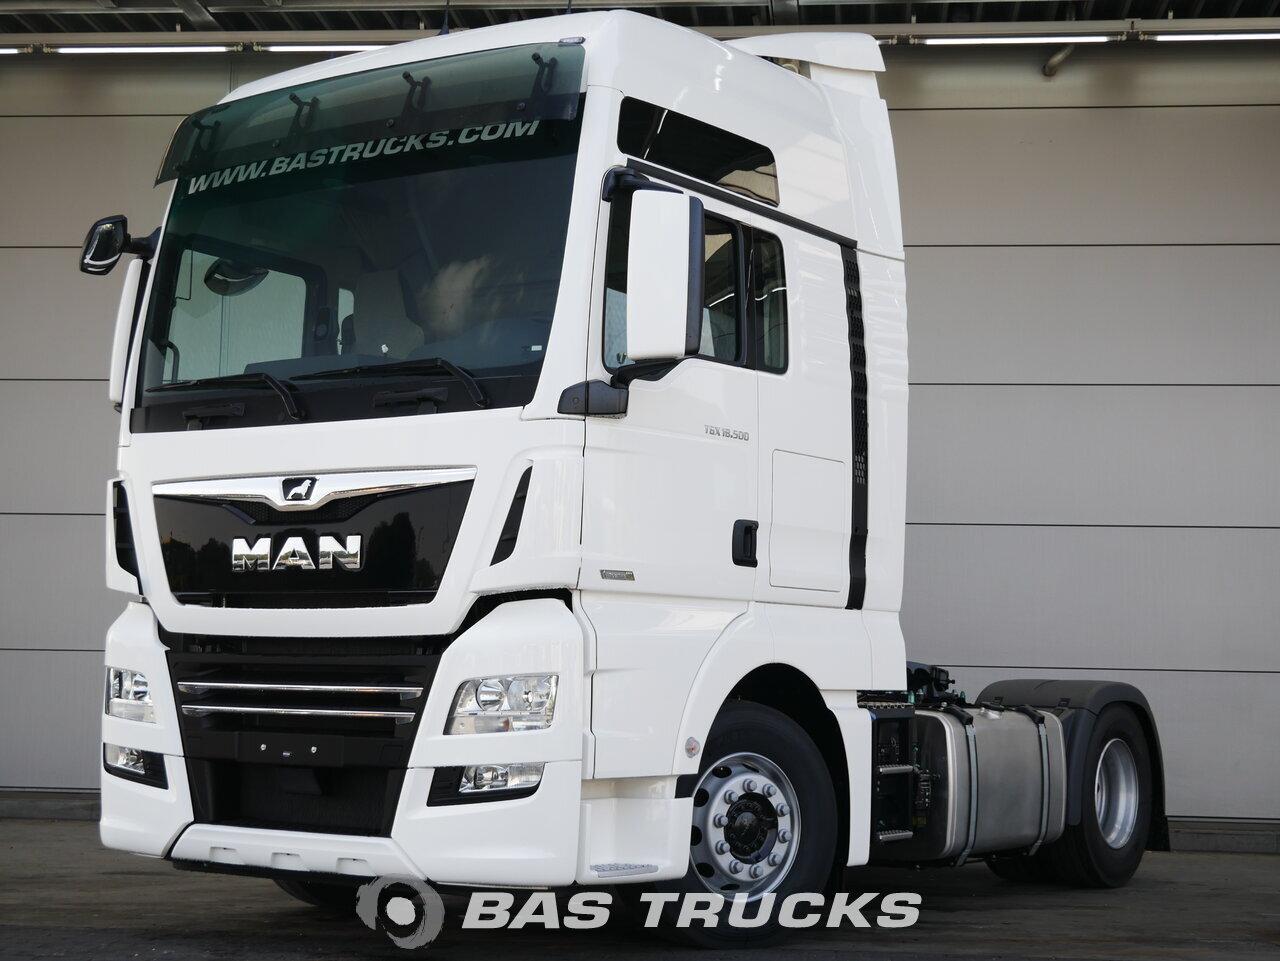 man tgx xxl tractorhead euro norm 6 77900 bas trucks. Black Bedroom Furniture Sets. Home Design Ideas